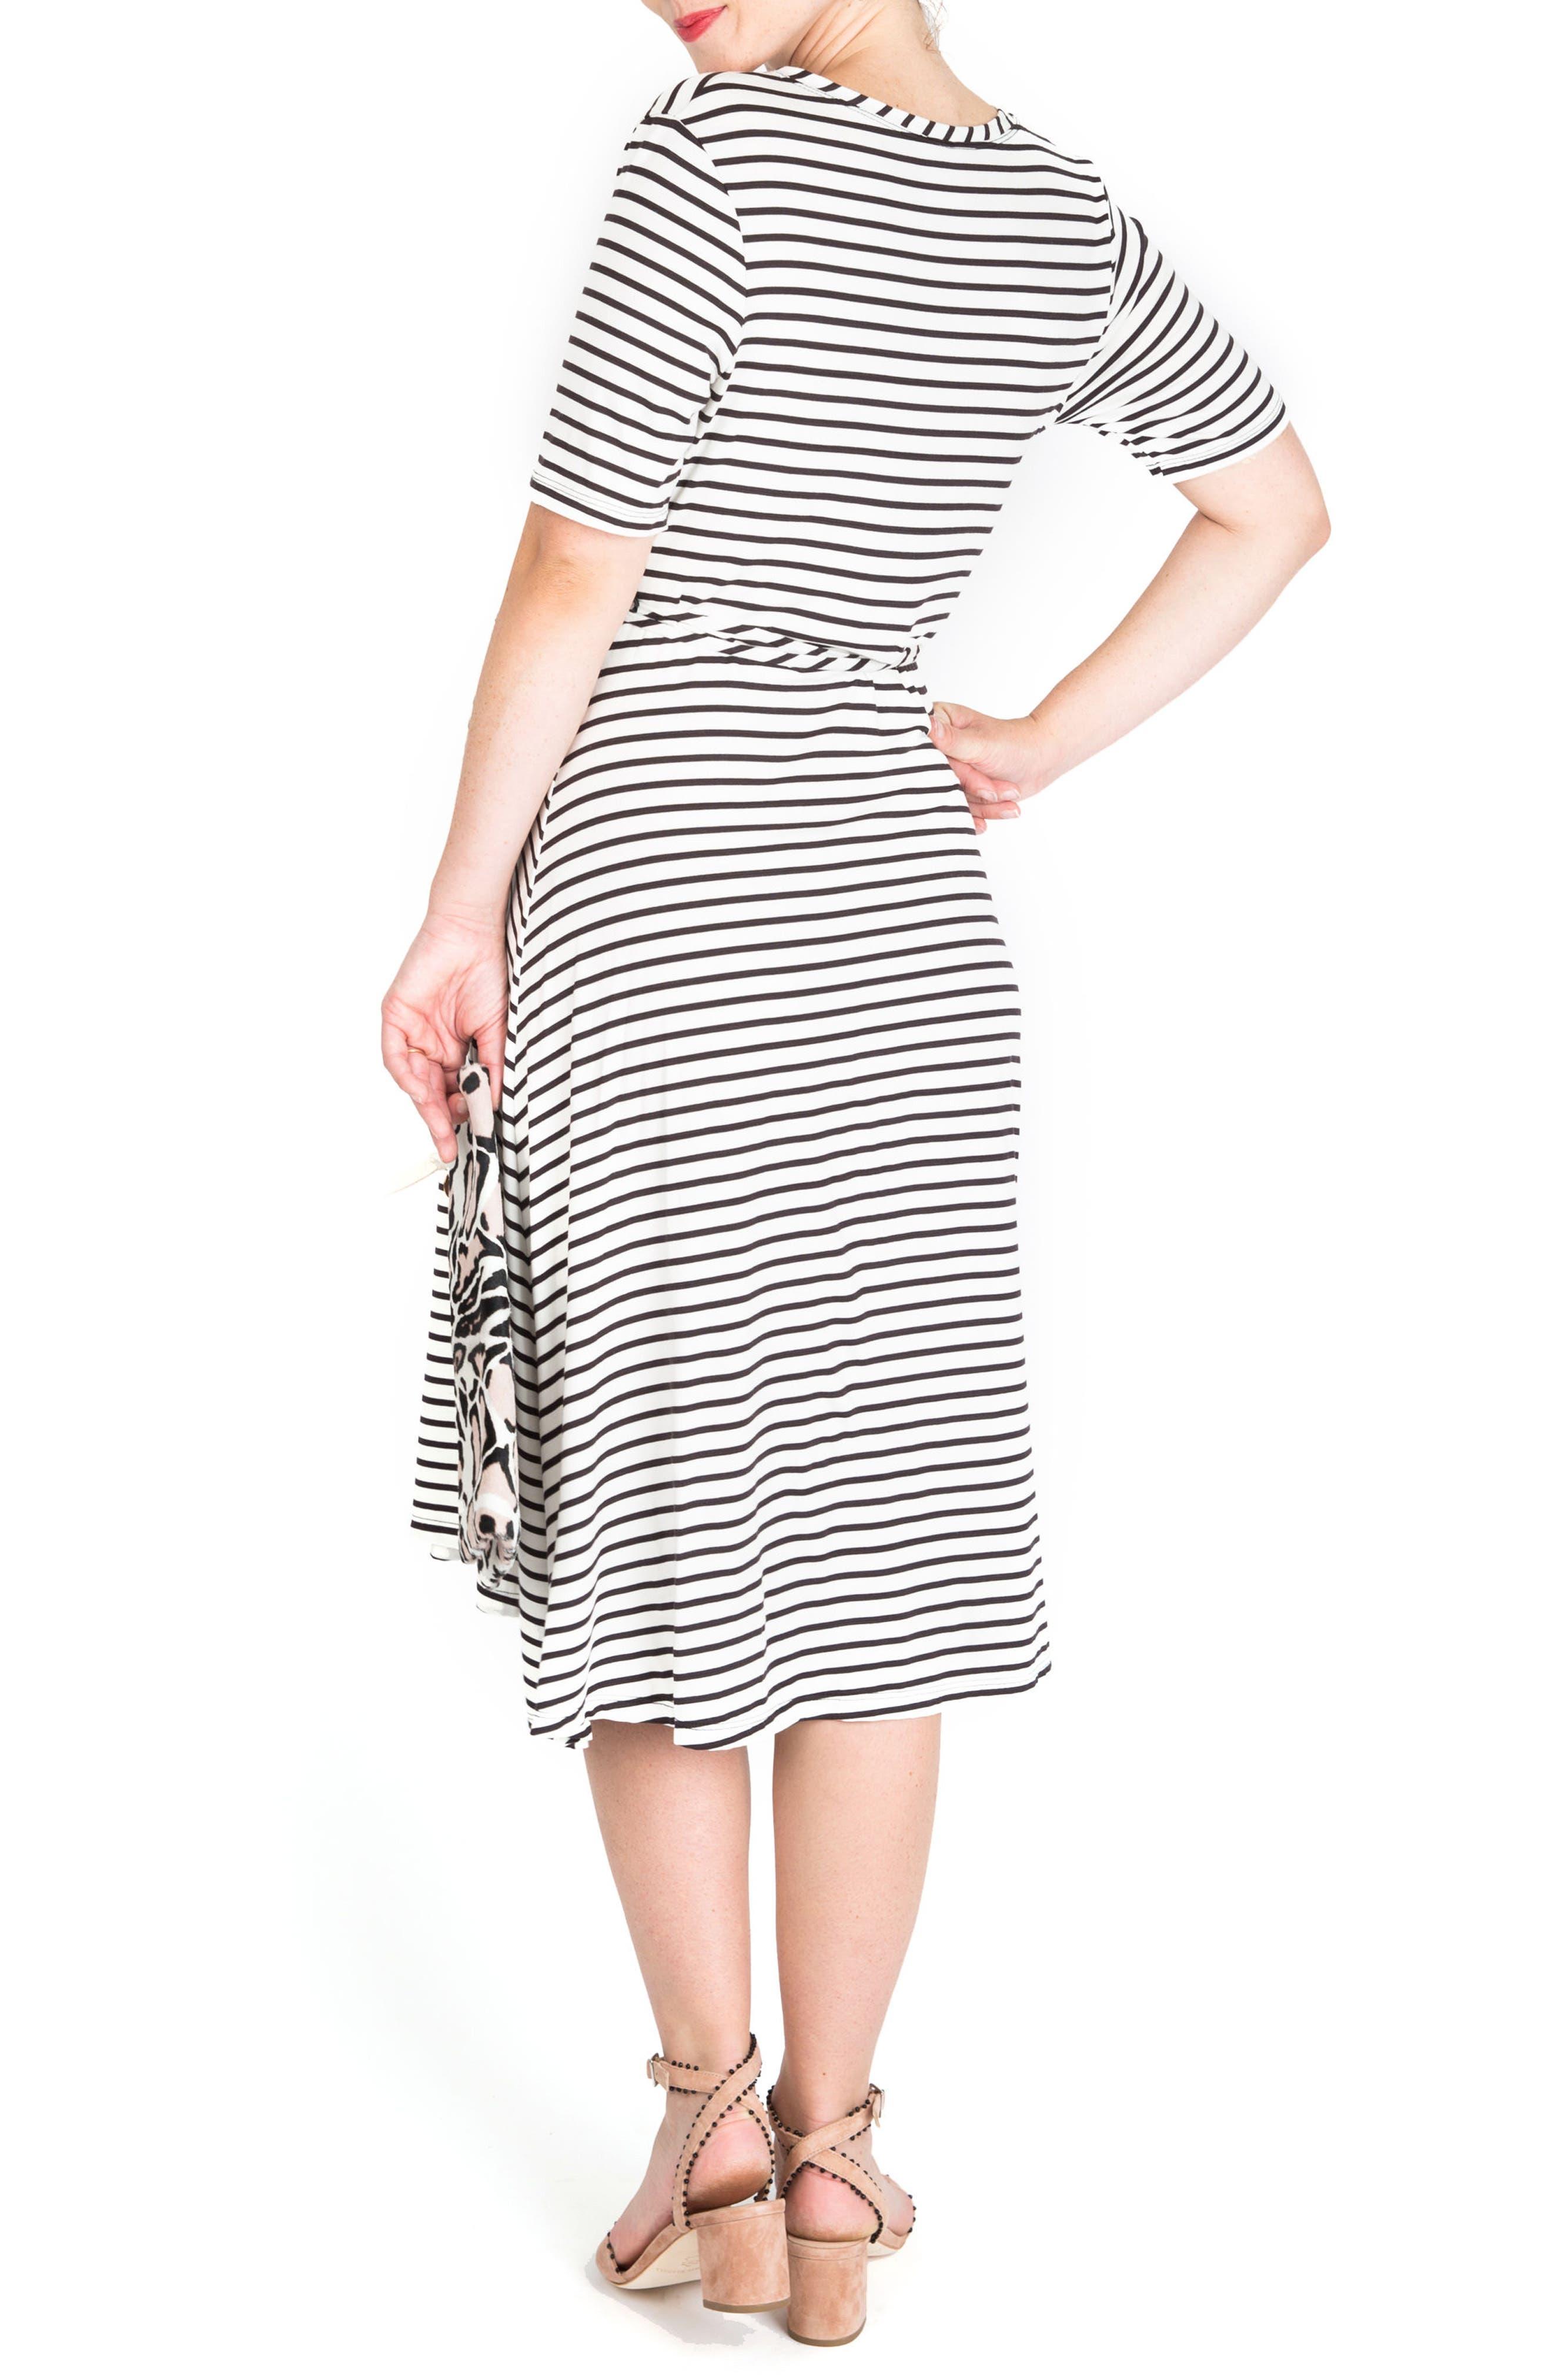 Maya Maternity/Nursing Wrap Dress,                             Alternate thumbnail 2, color,                             Black/ White Stripe